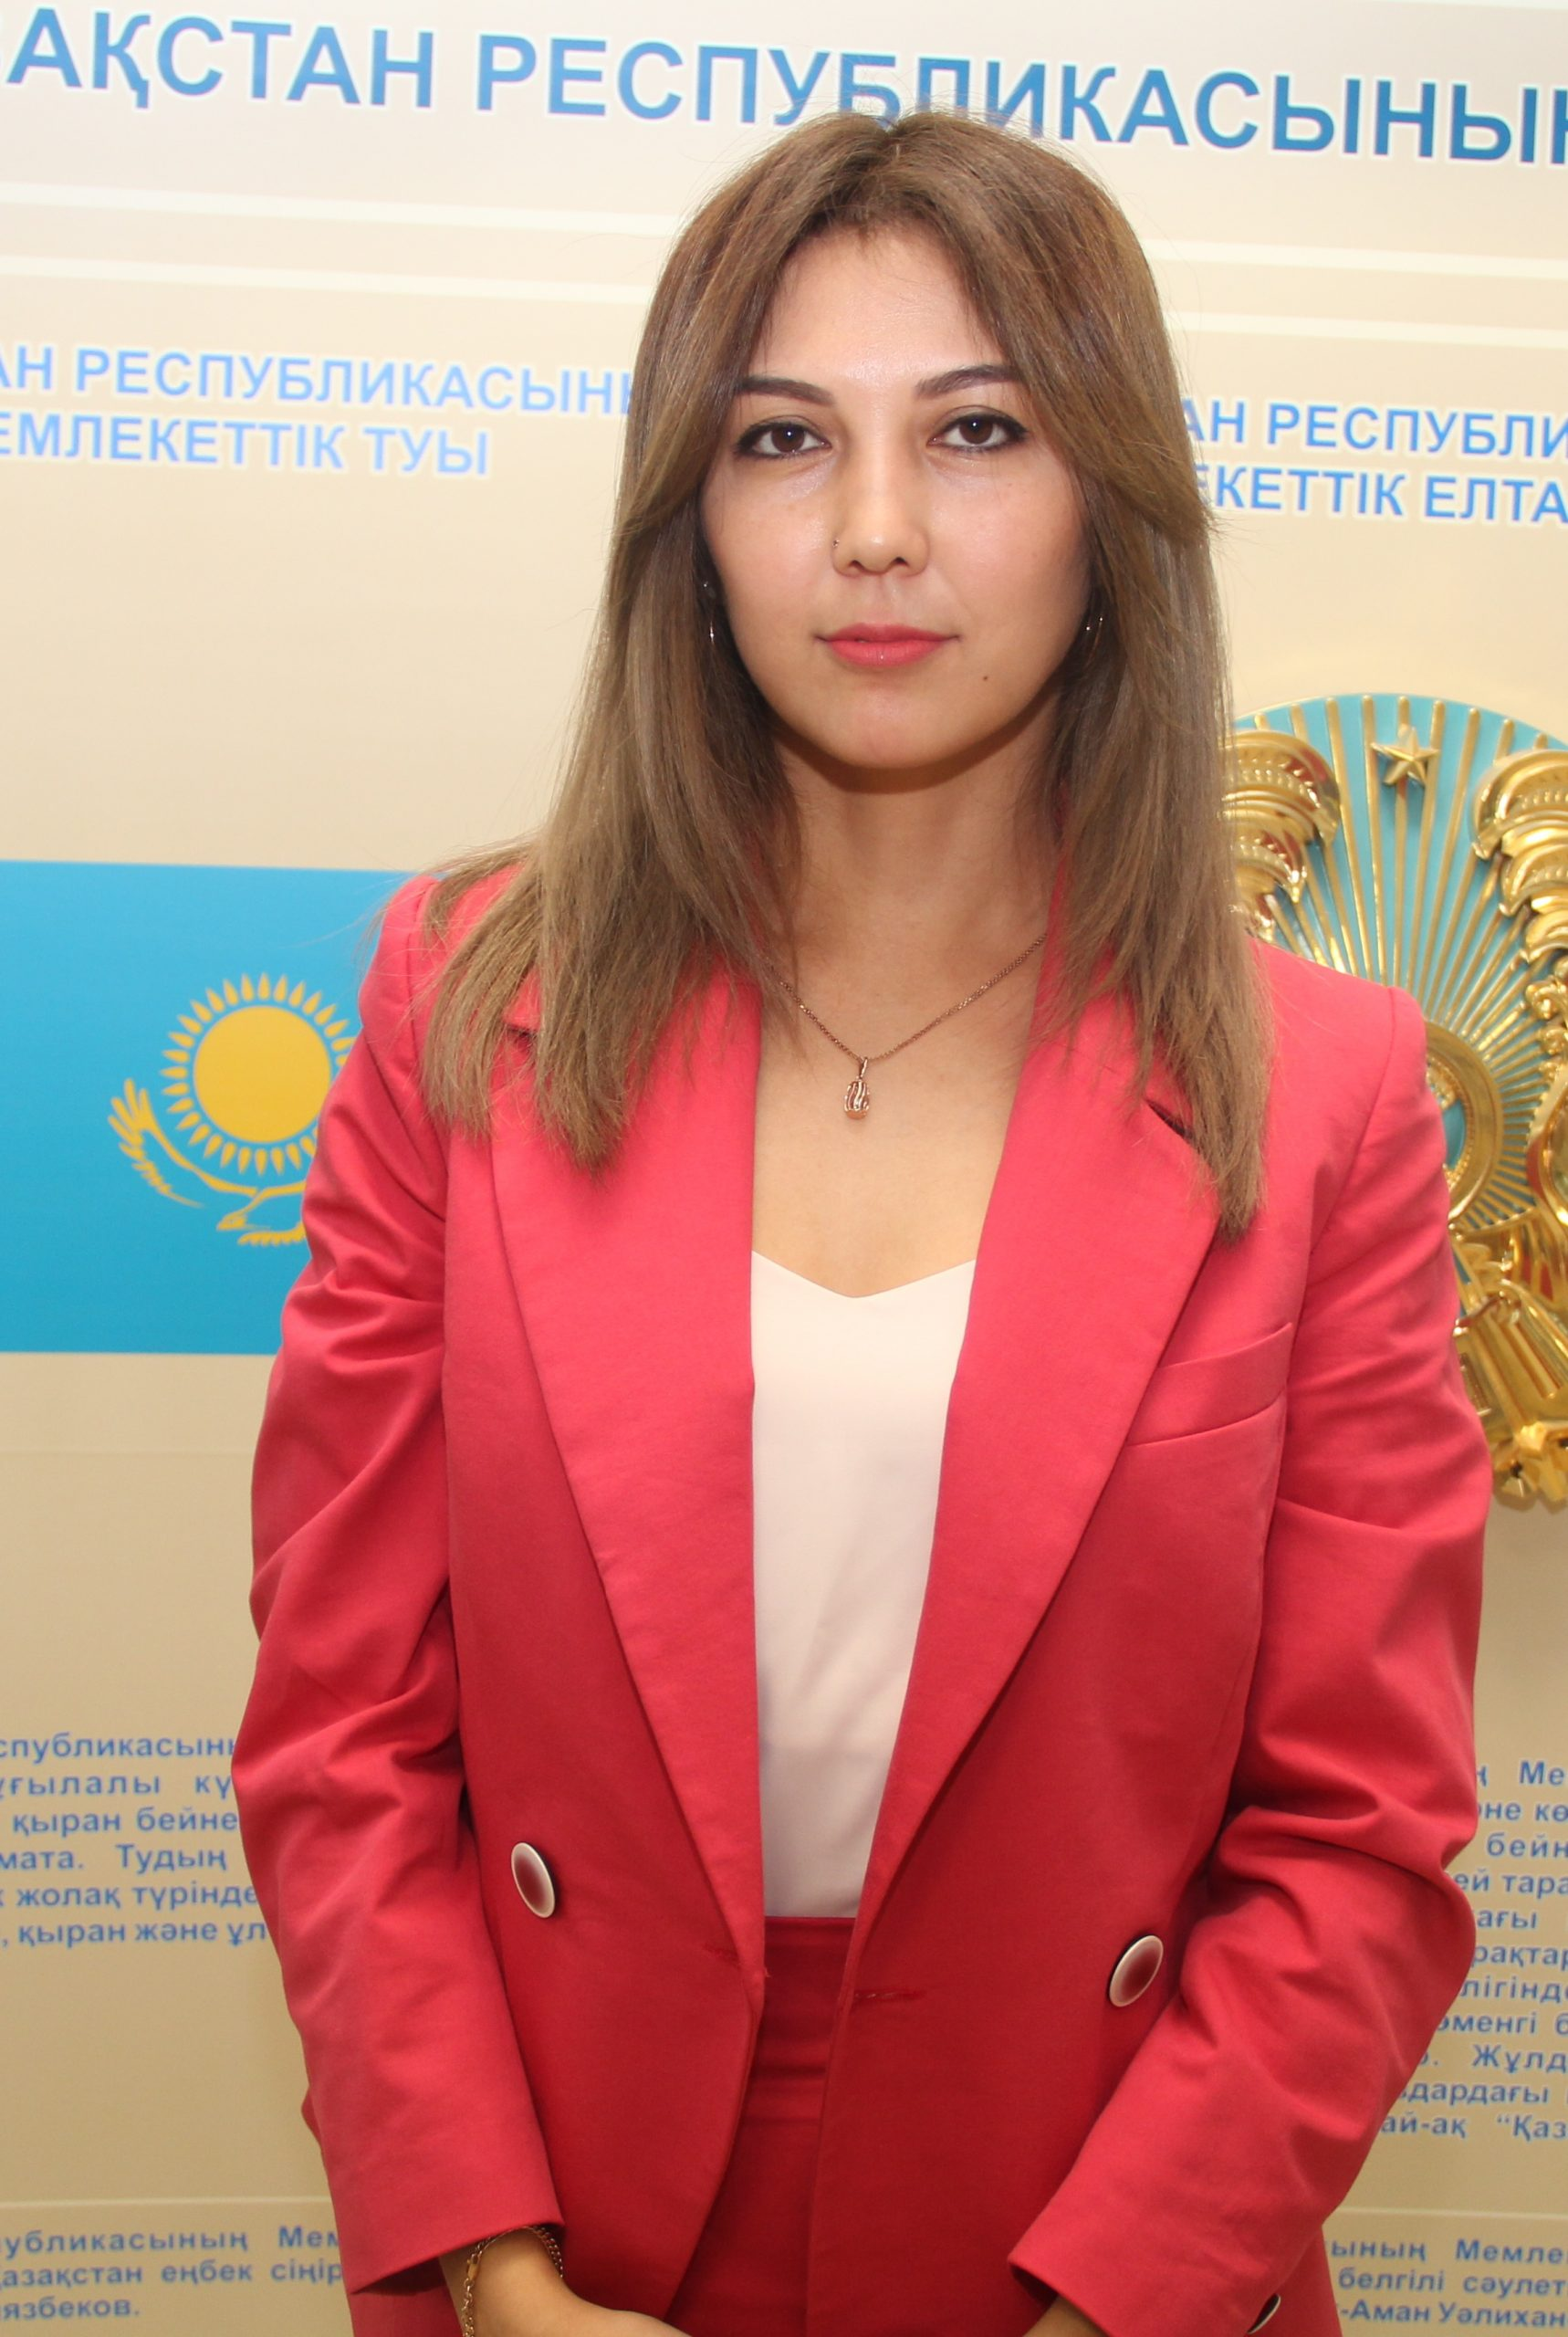 Казбекова Дария Жумабековна